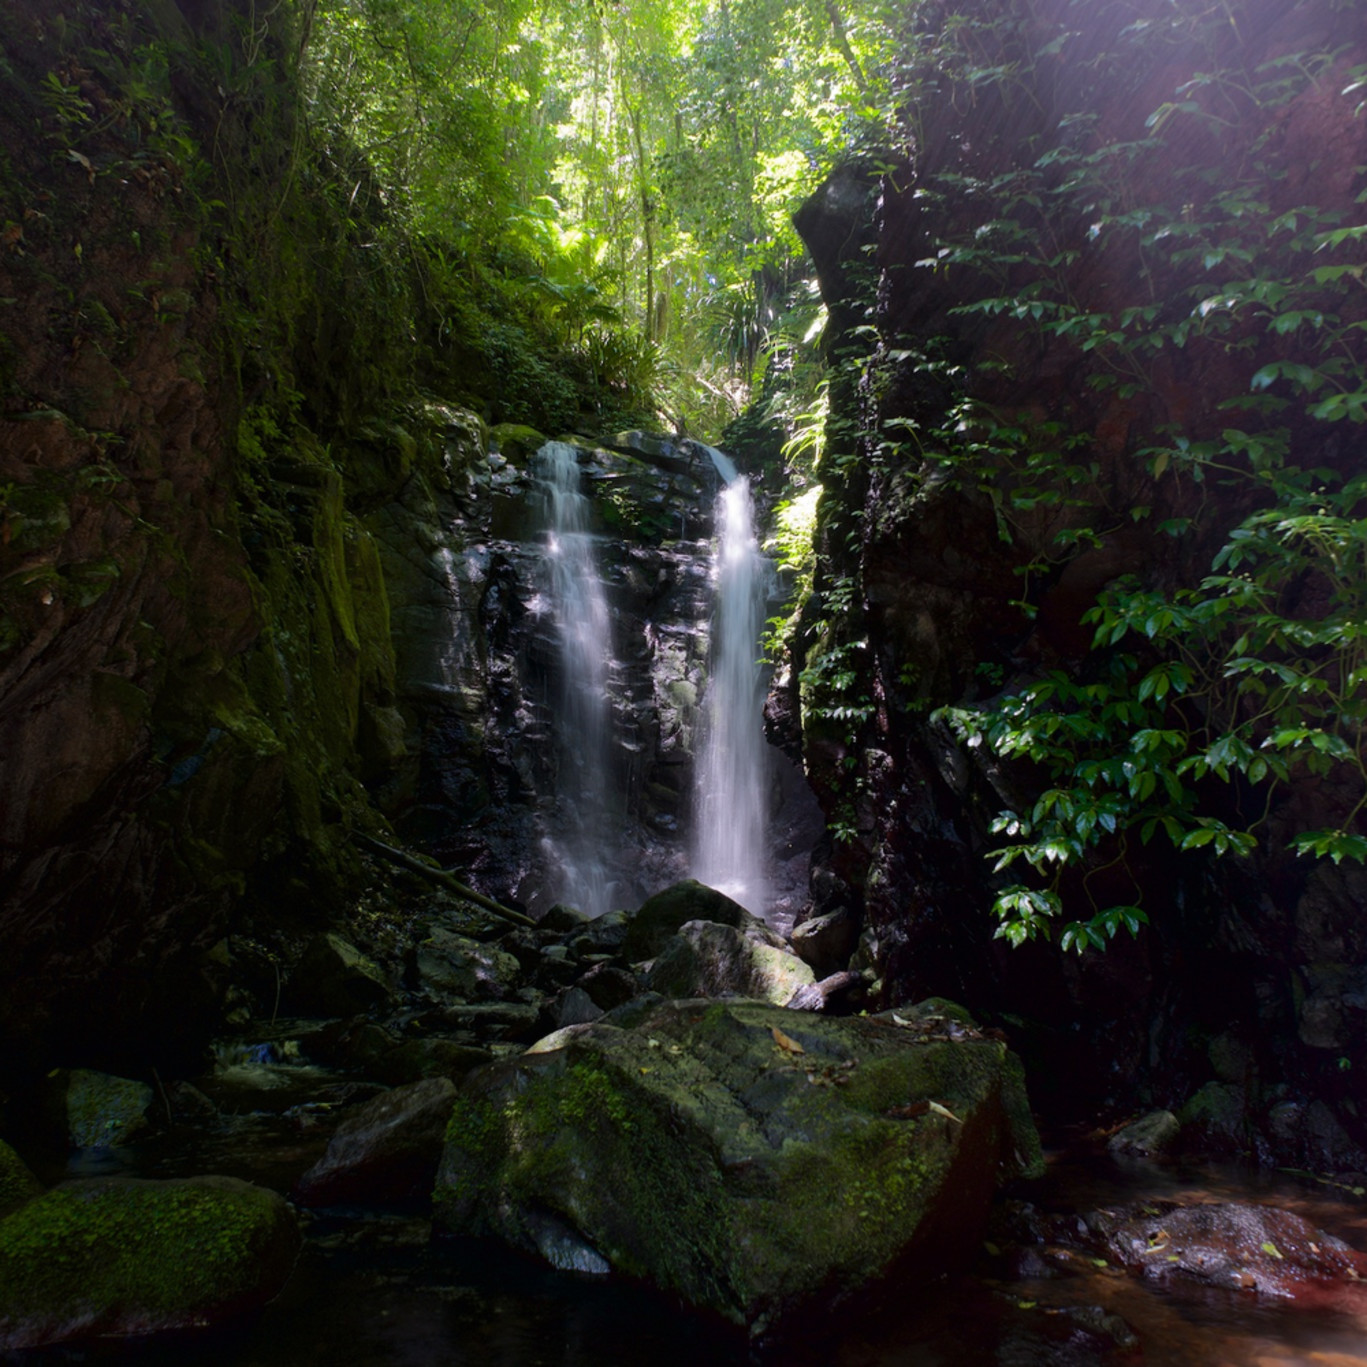 Green with envy box log falls waterfall lamington national park qld australia jcthjg